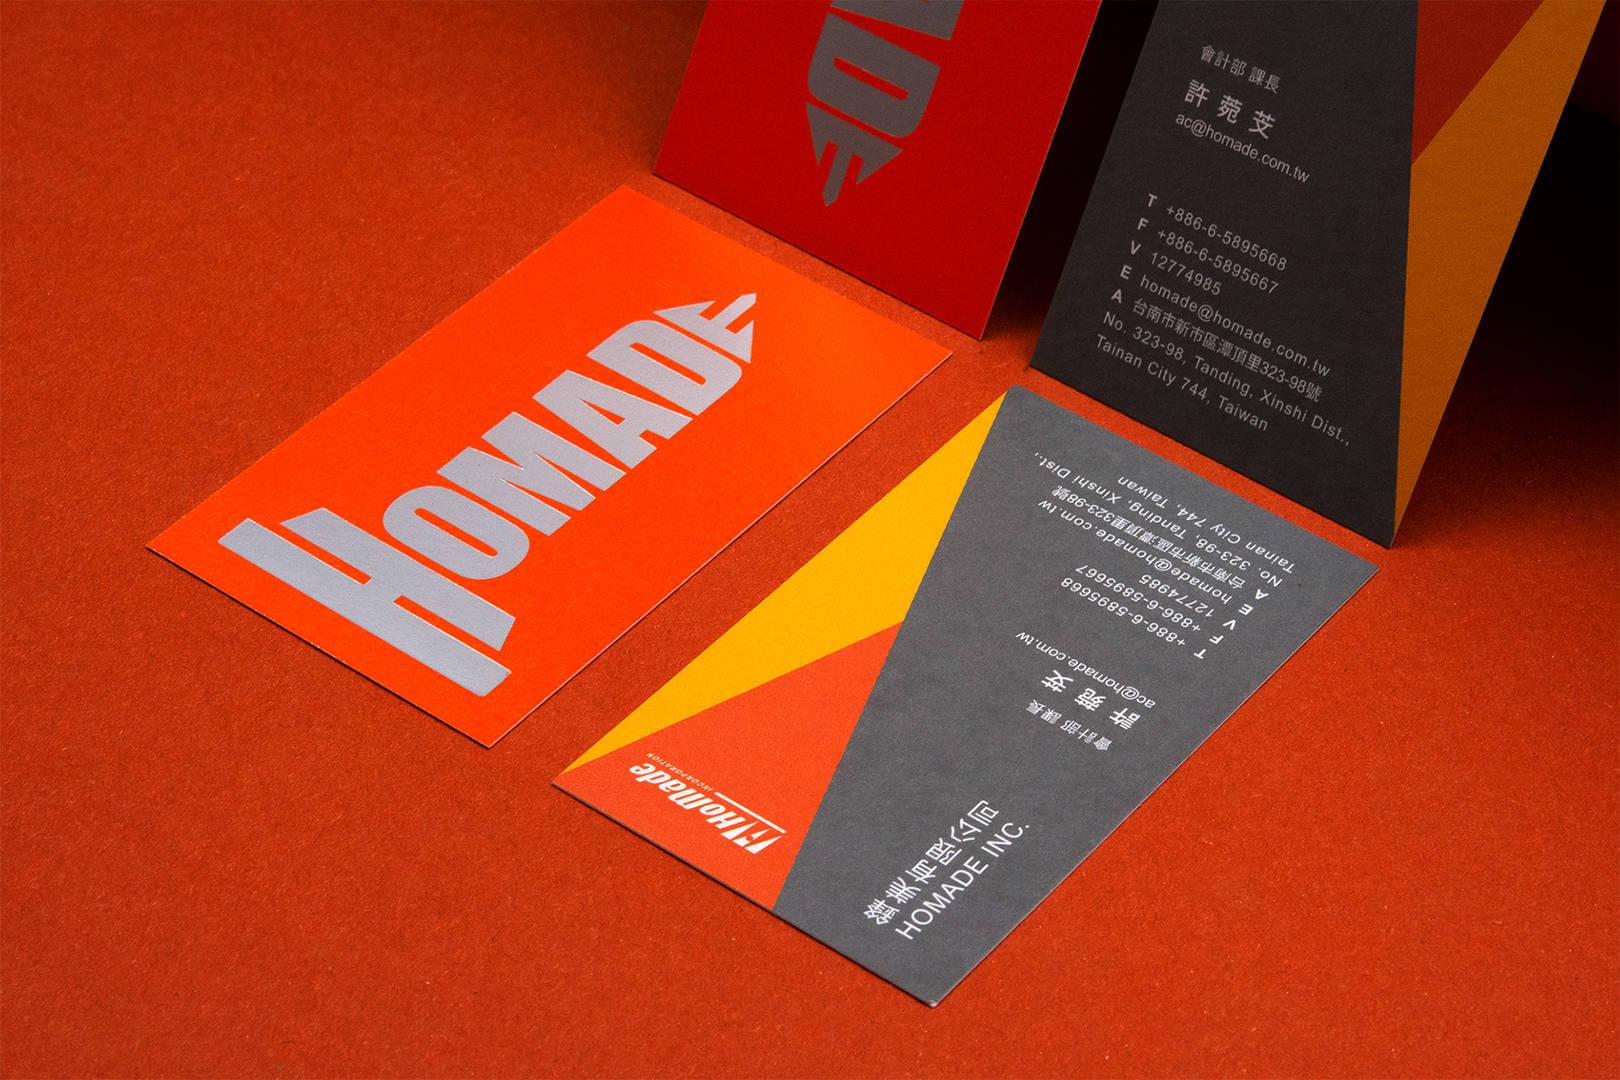 鋒美有限公司HOMADE Business Card Design